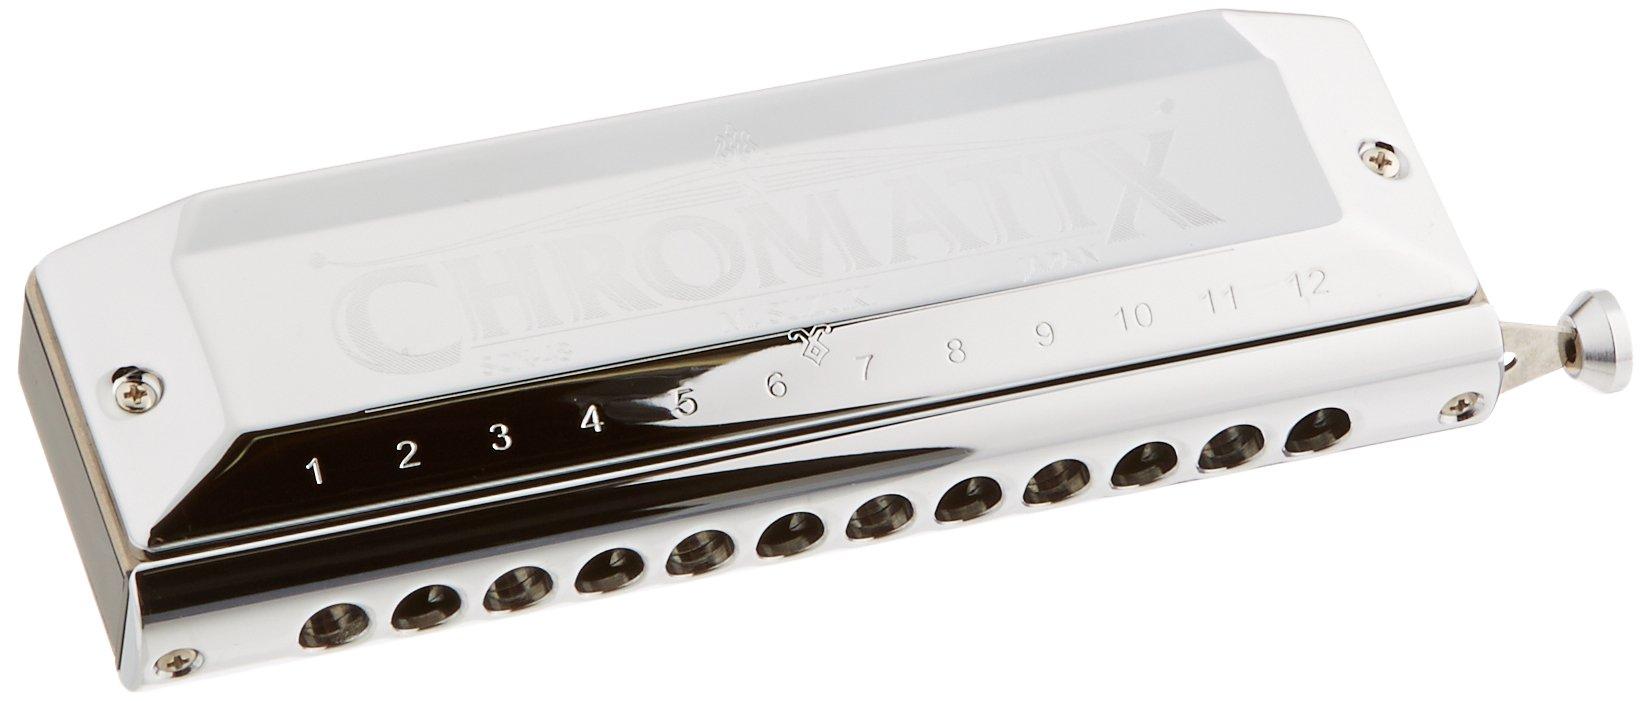 Suzuki SCX48-D Harmonica